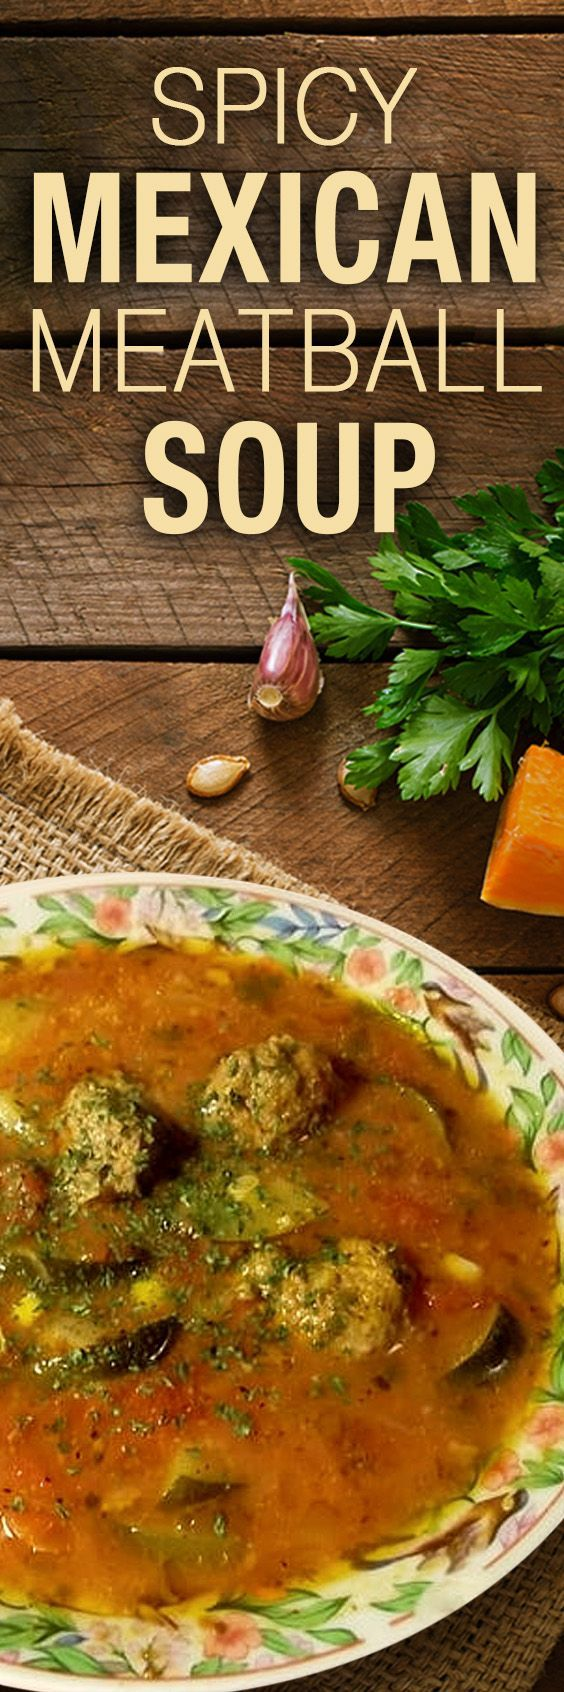 Best 25+ Mexican meatballs ideas on Pinterest   Mexican ...